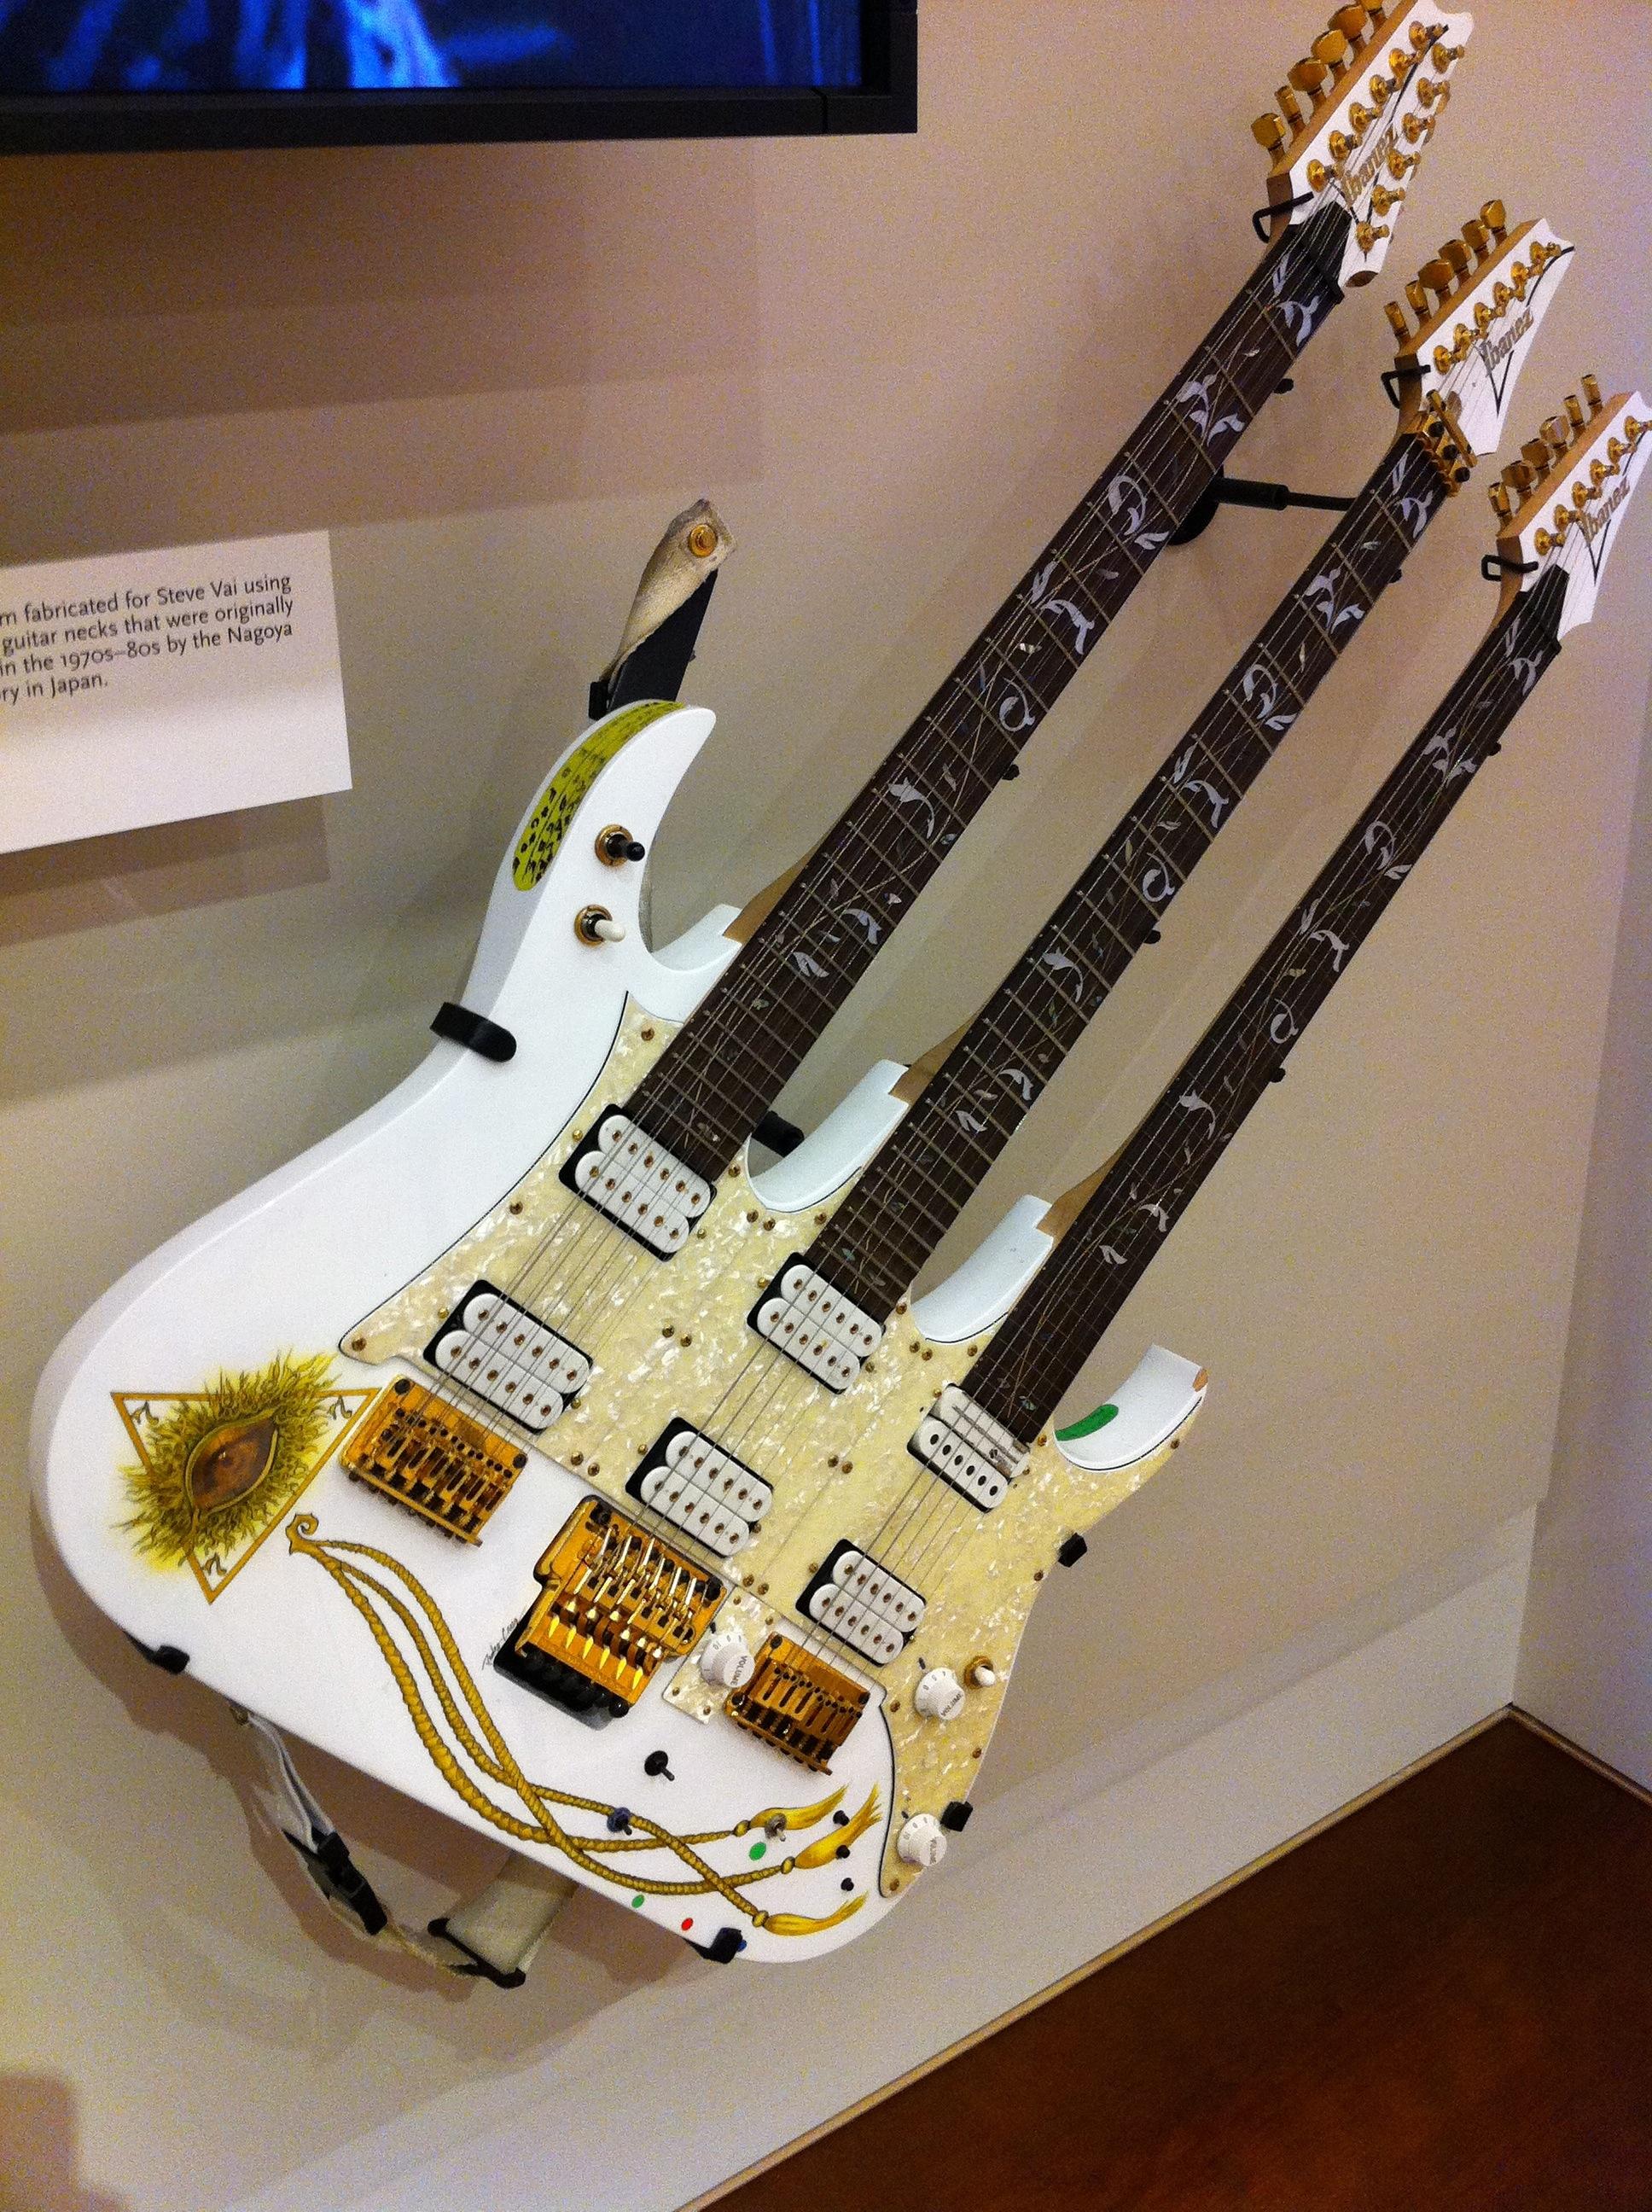 file steve vai 39 s ibanez triple neck guitar mim wikimedia commons. Black Bedroom Furniture Sets. Home Design Ideas